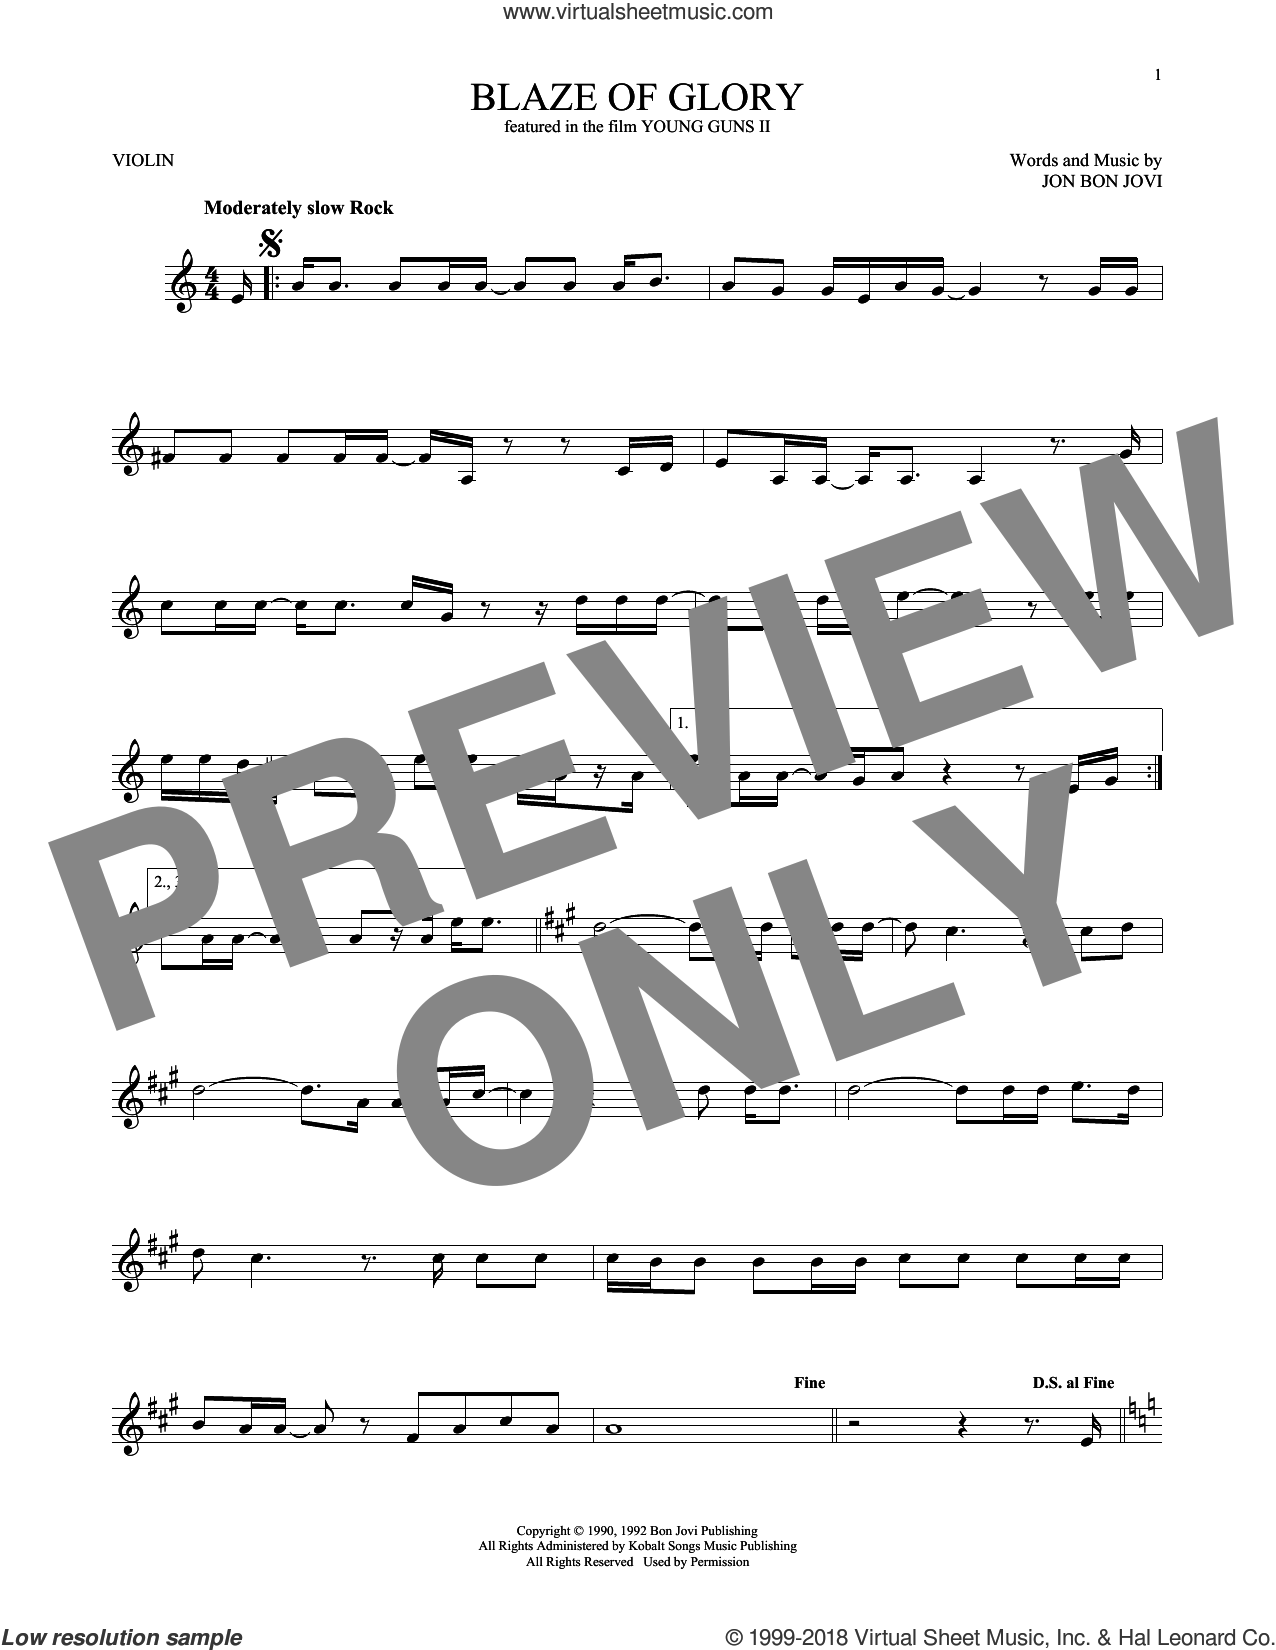 Blaze Of Glory sheet music for violin solo by Bon Jovi, intermediate skill level